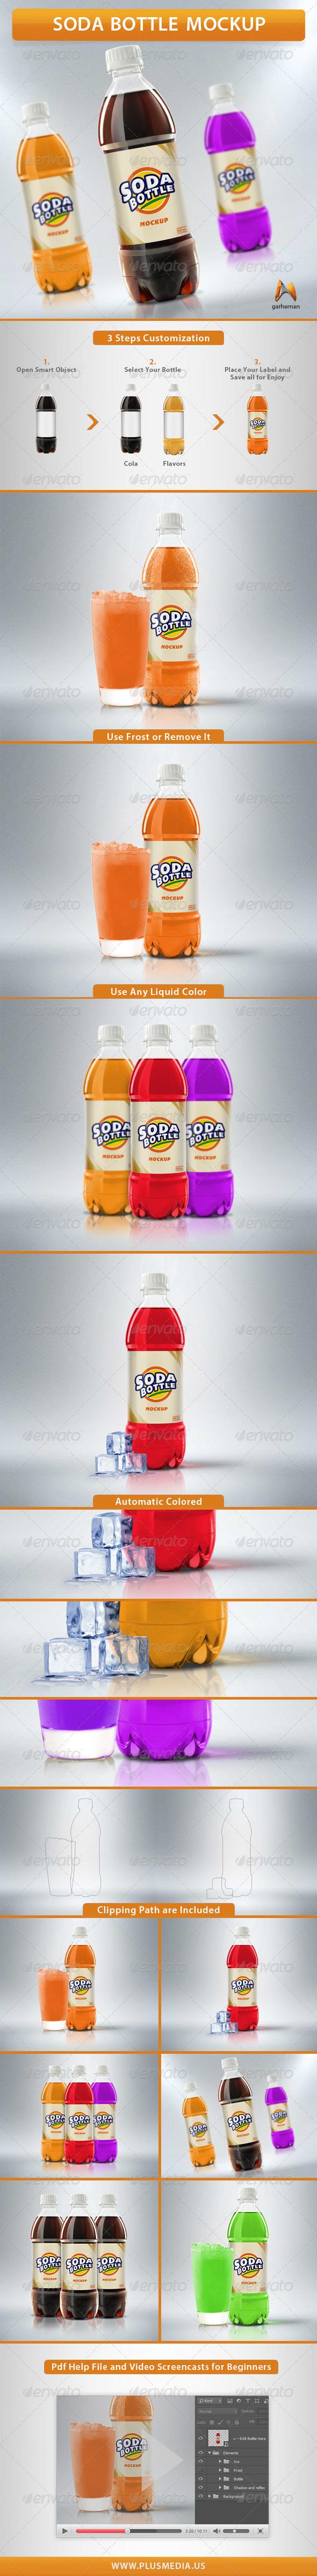 Soda Bottle Mockup - Food and Drink Packaging